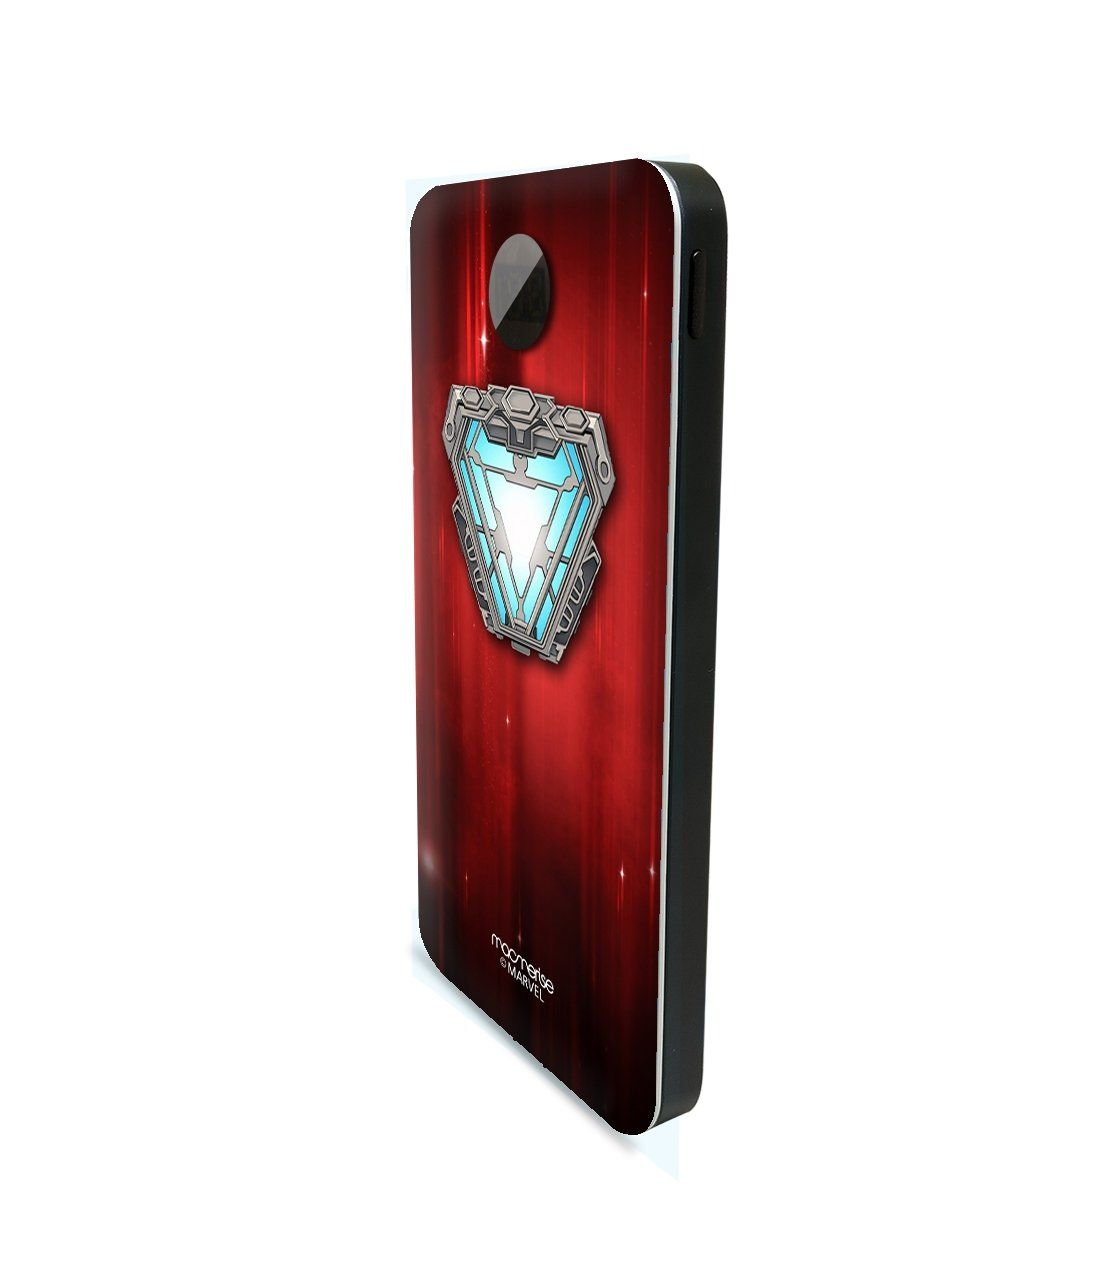 Iron man Infinity Arc Reactor - 10000 mAh Universal Power Bank